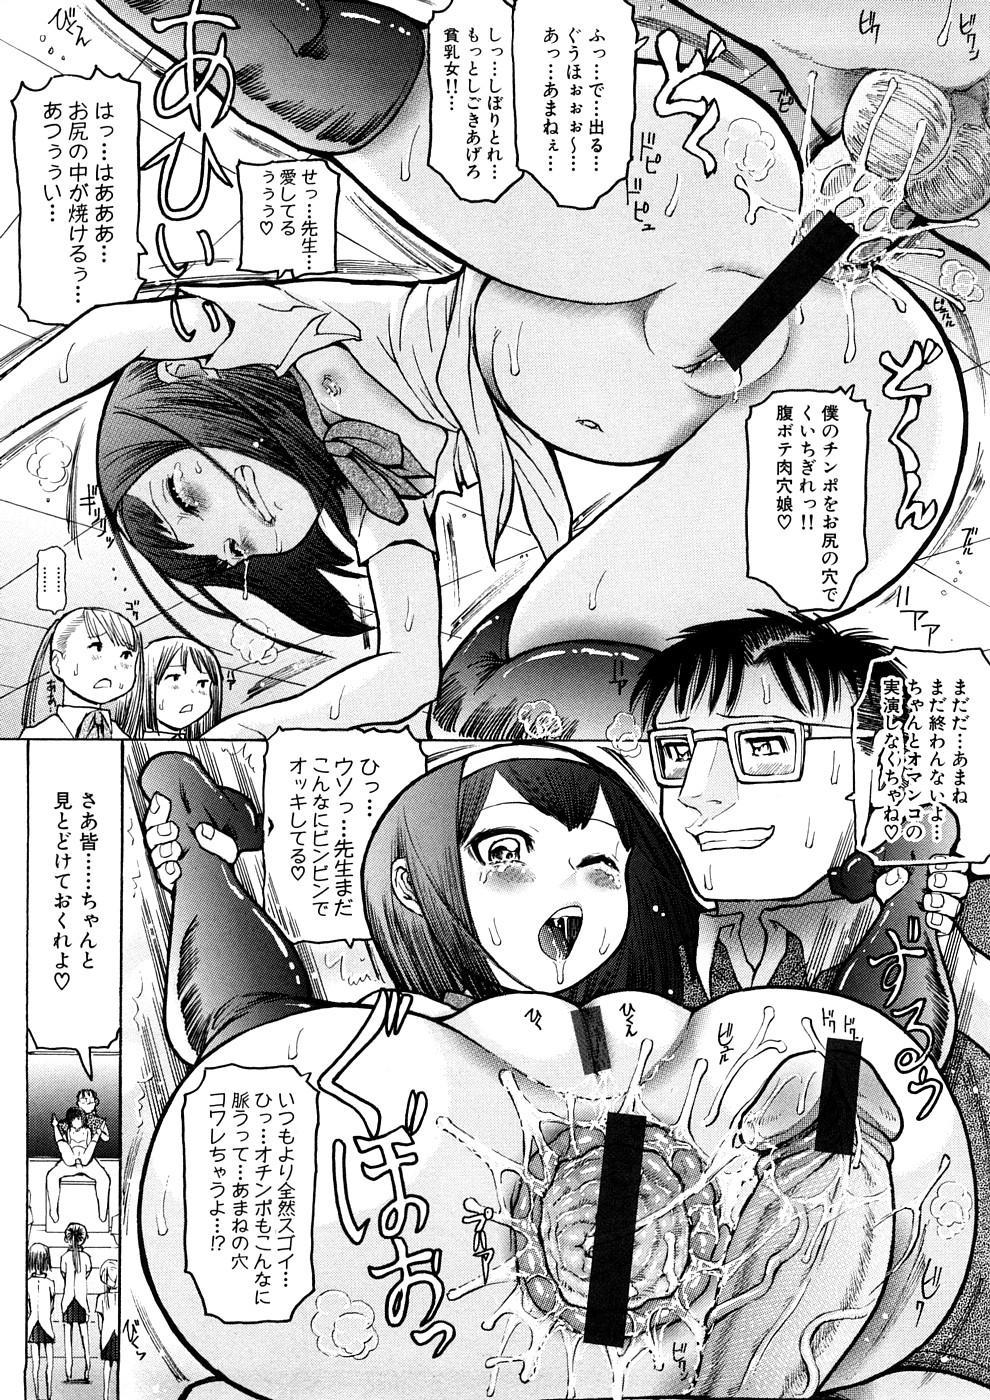 Geki Yaba Anthology Vol. 1 - Naka ni Dashite yo 134